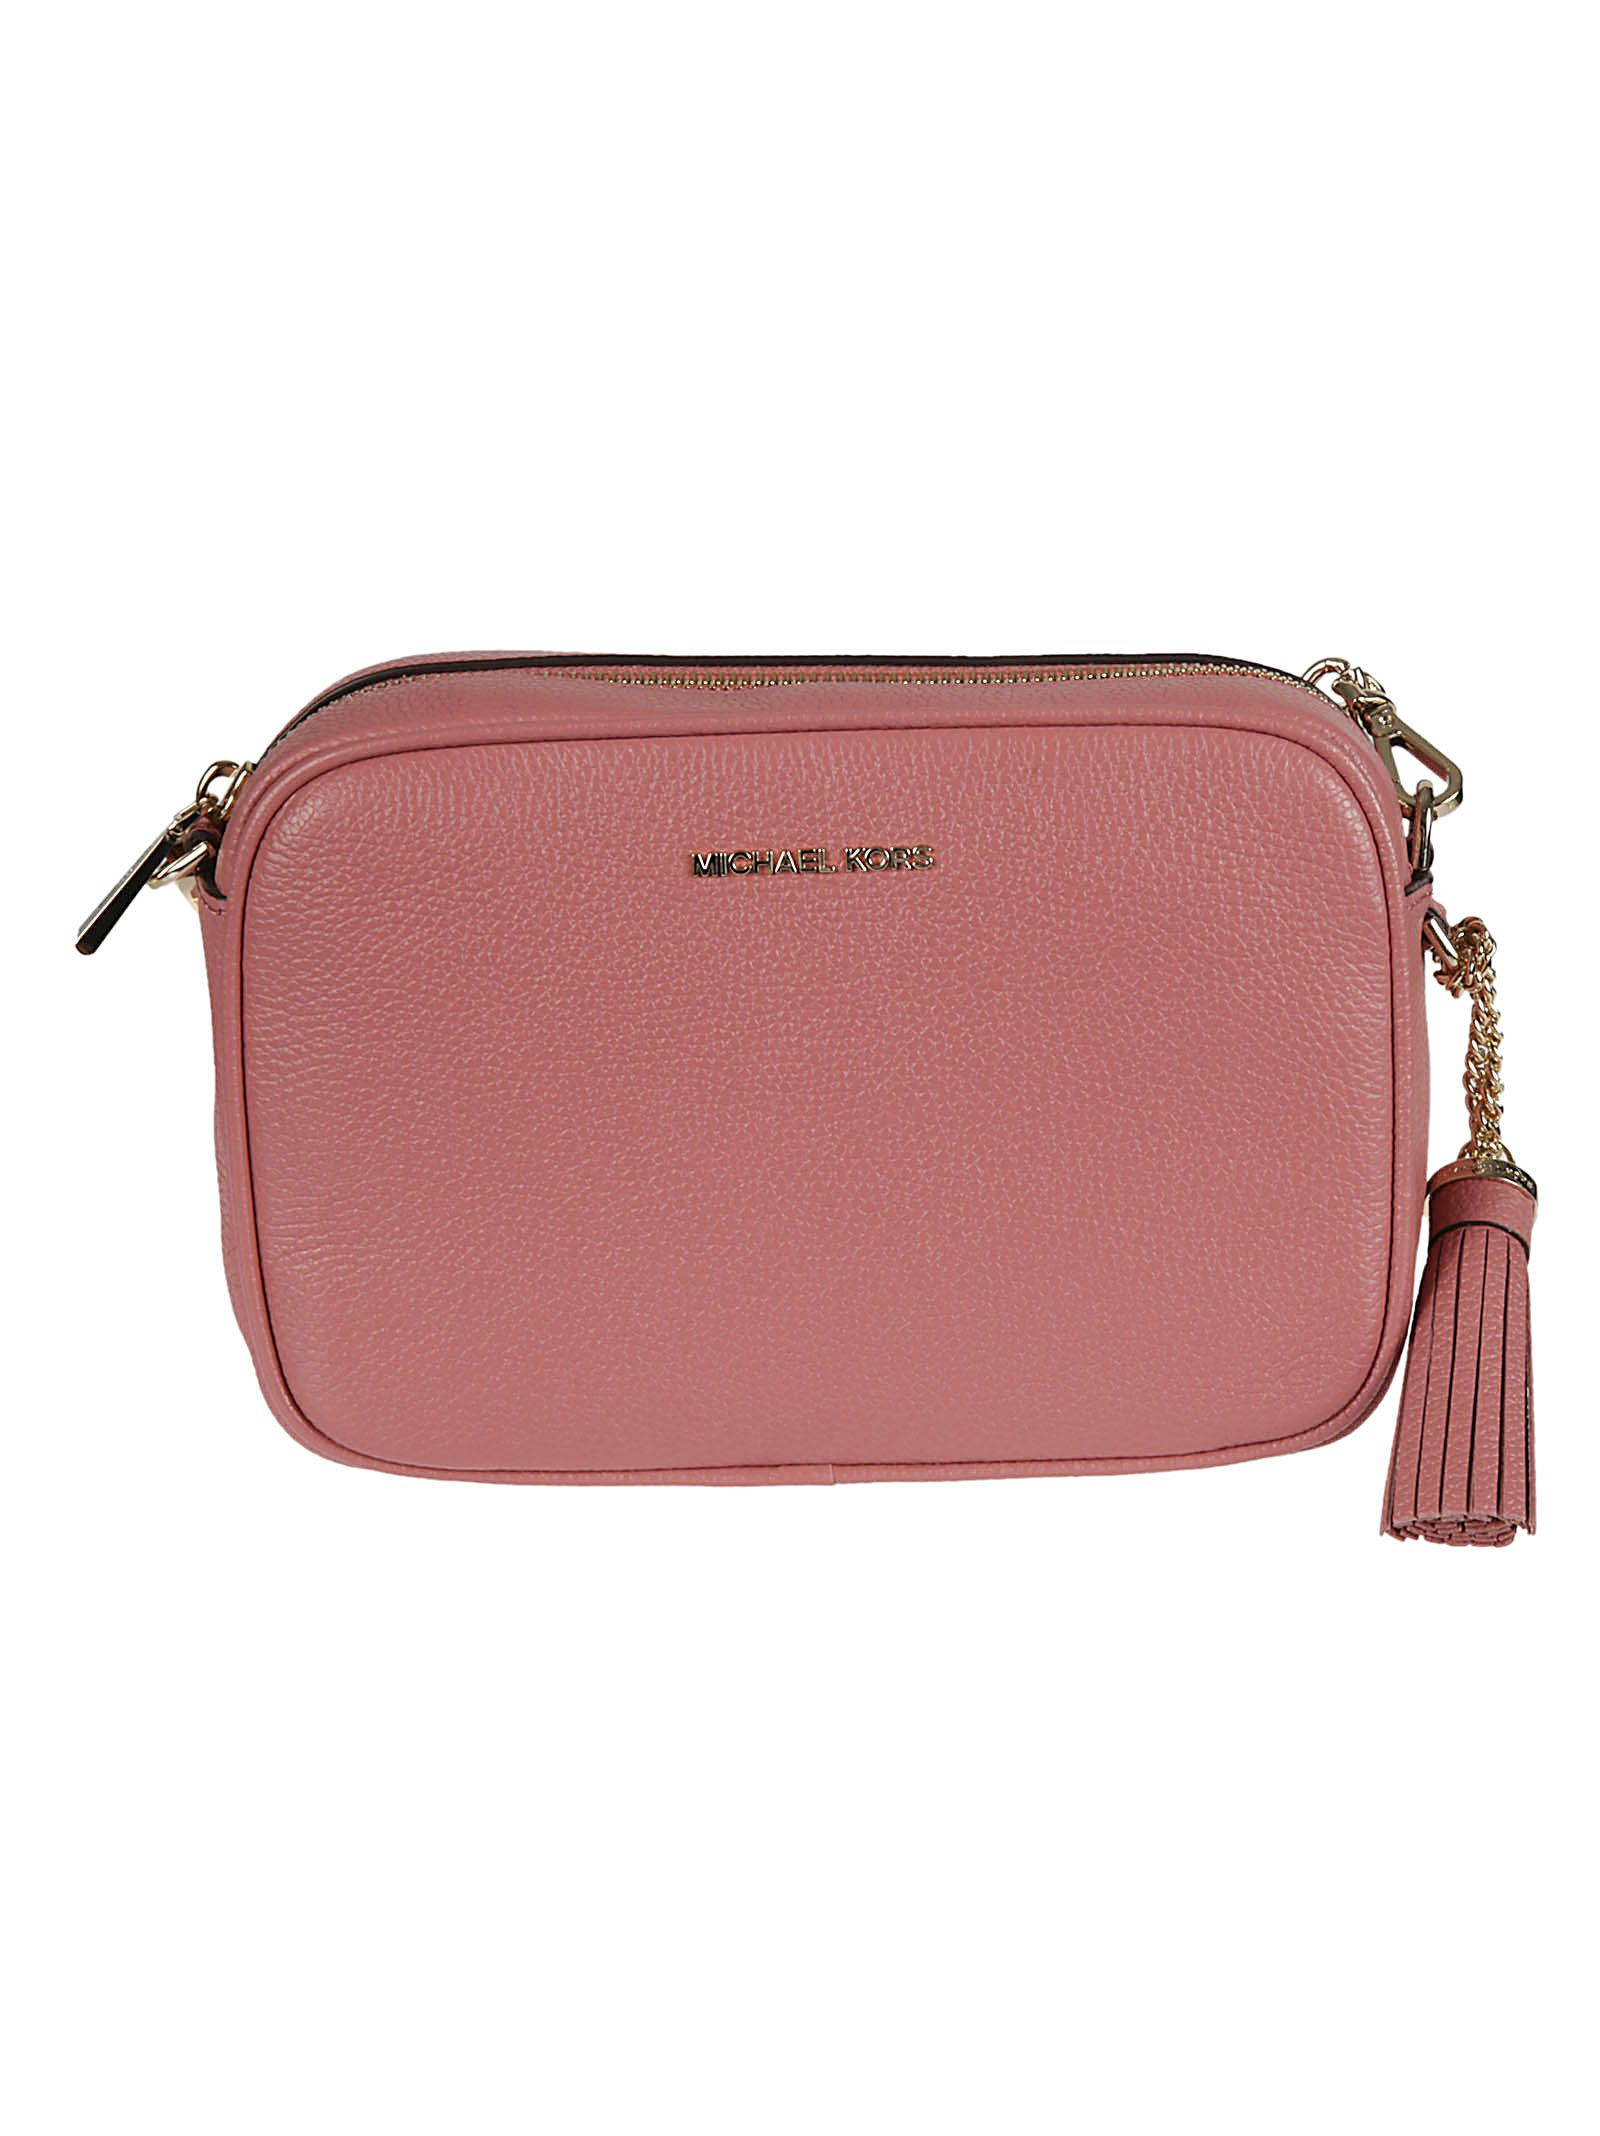 0503594da8ce2 Michael Kors Michael Kors Ginny Crossbody Bag - Pink - 10801857 ...